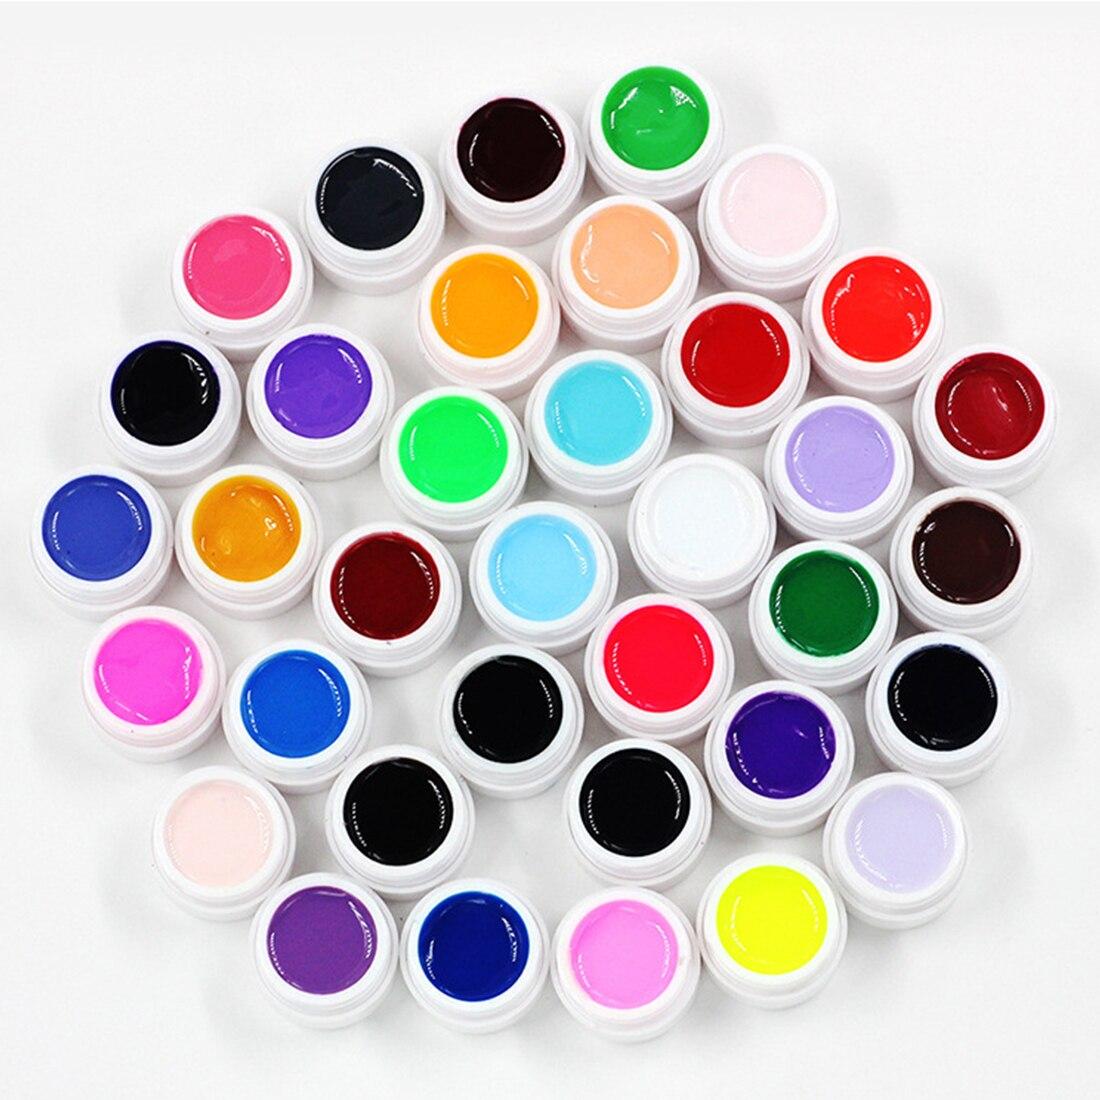 цена на Hot 36 Boxes Solid Color Nail Gel Pure Colors UV Gel Shiny Extension Longlasting Nail Art Tips Glue Nail Painting Polish Varnish